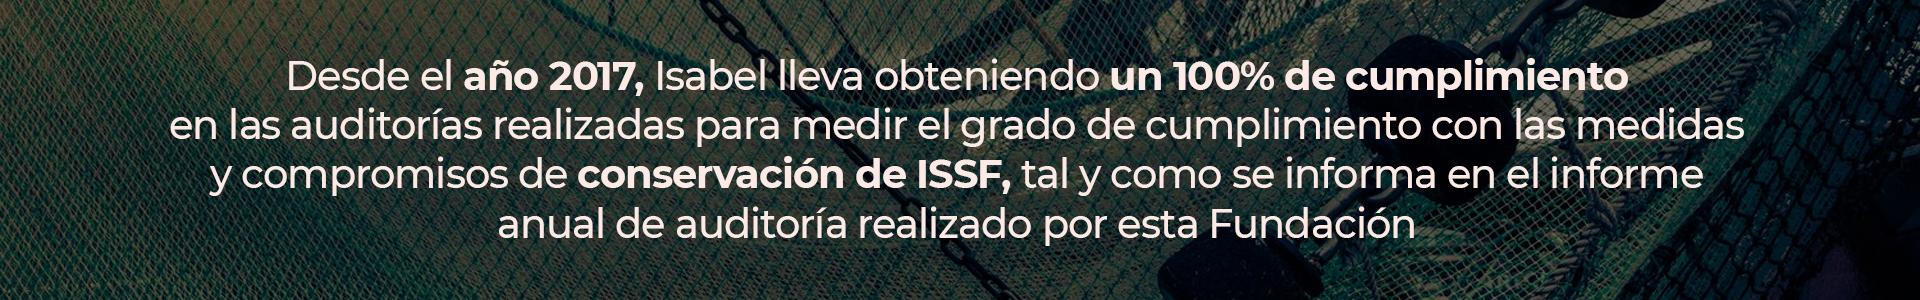 Destacado ISSF